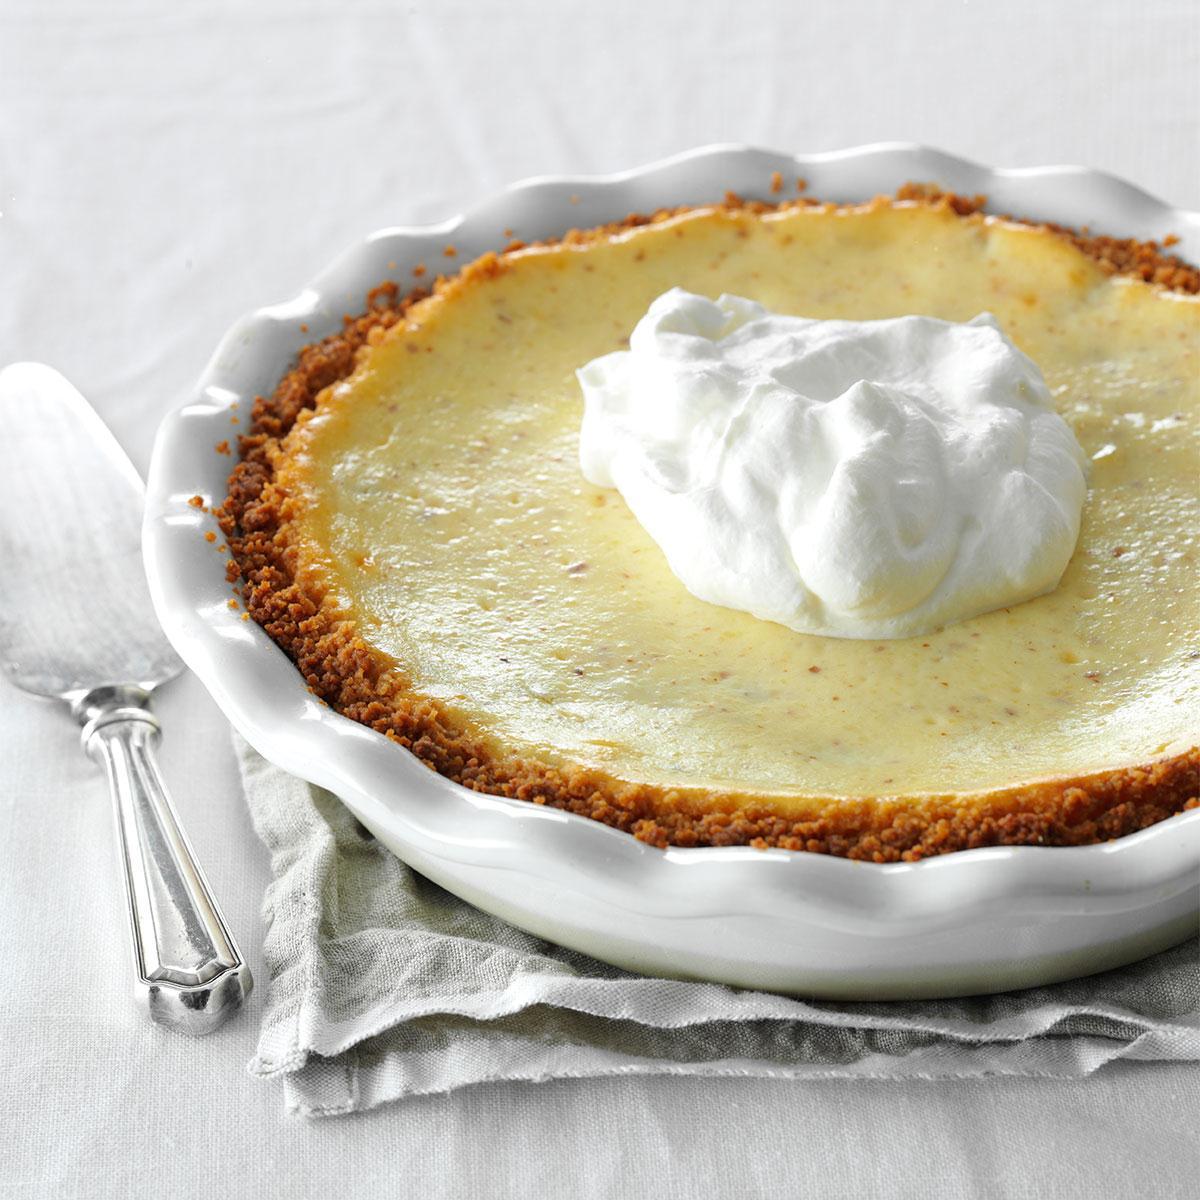 Pineapple-Coconut Cream Pie picture